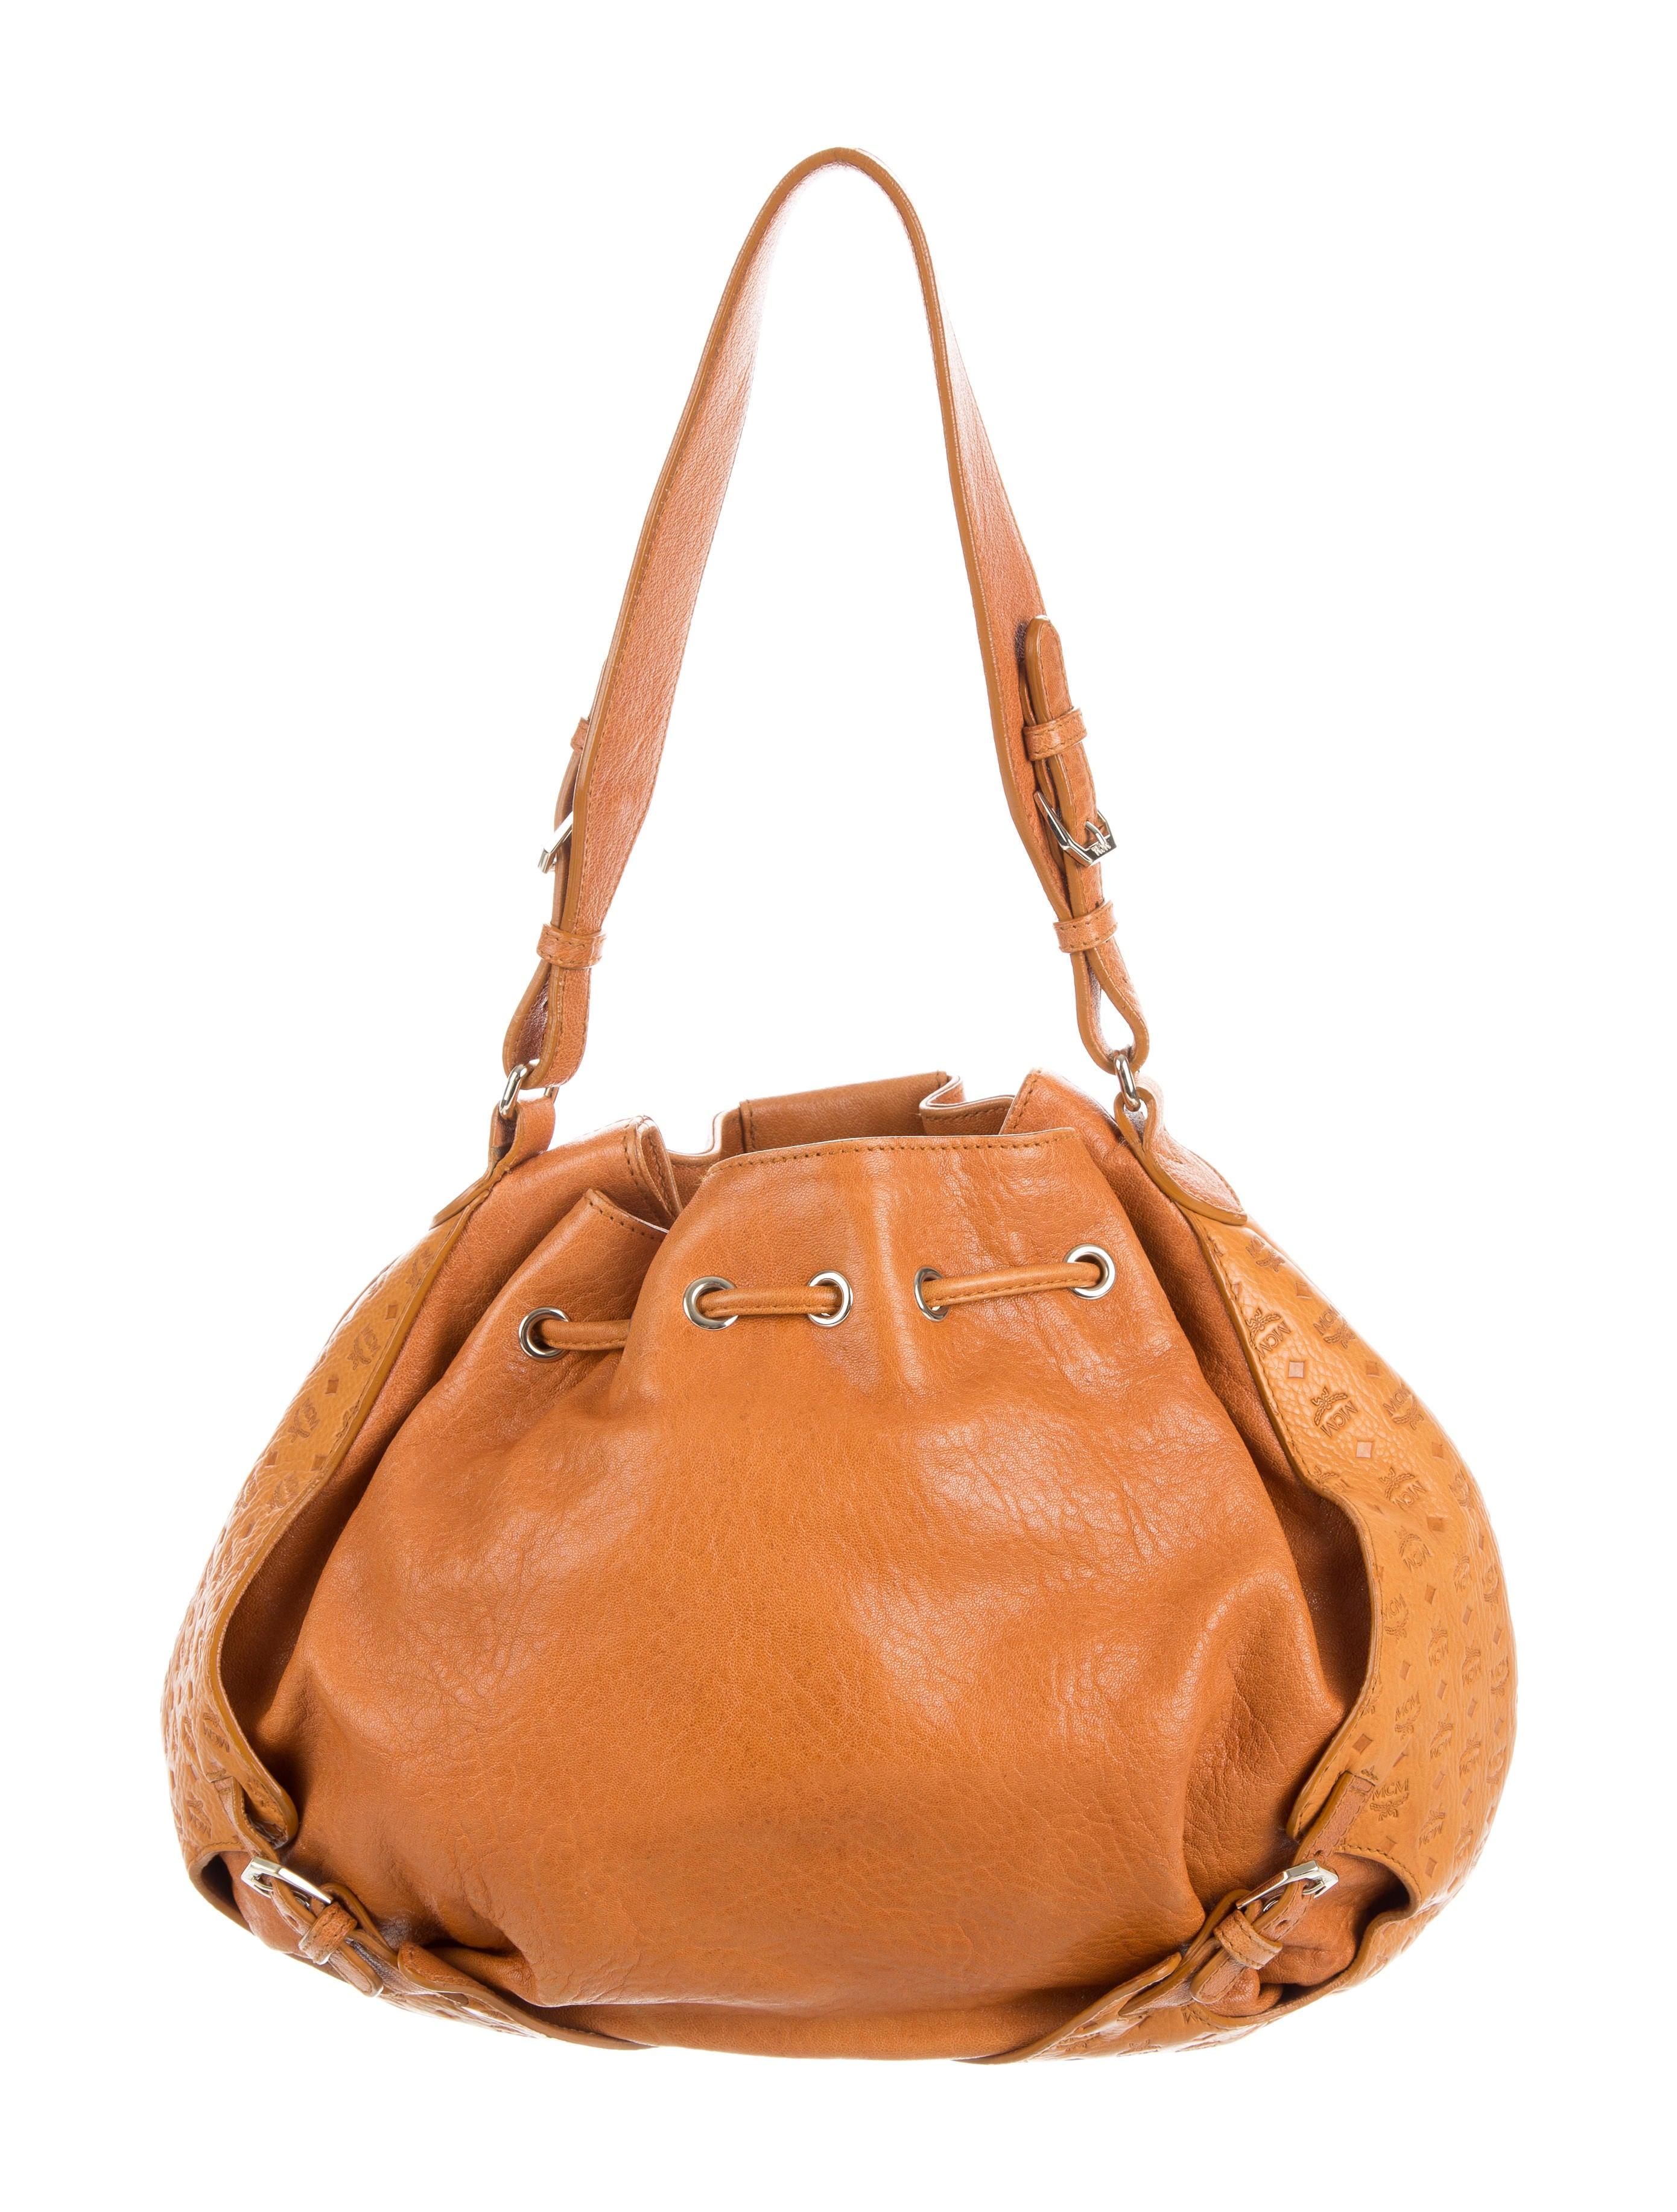 Discover luxury women's handbags from Saint Laurent: iconic shoulder bags, satchels, clutches, and top handles including Sac De Jour Saint Laurent - fbcpmhoe.cf